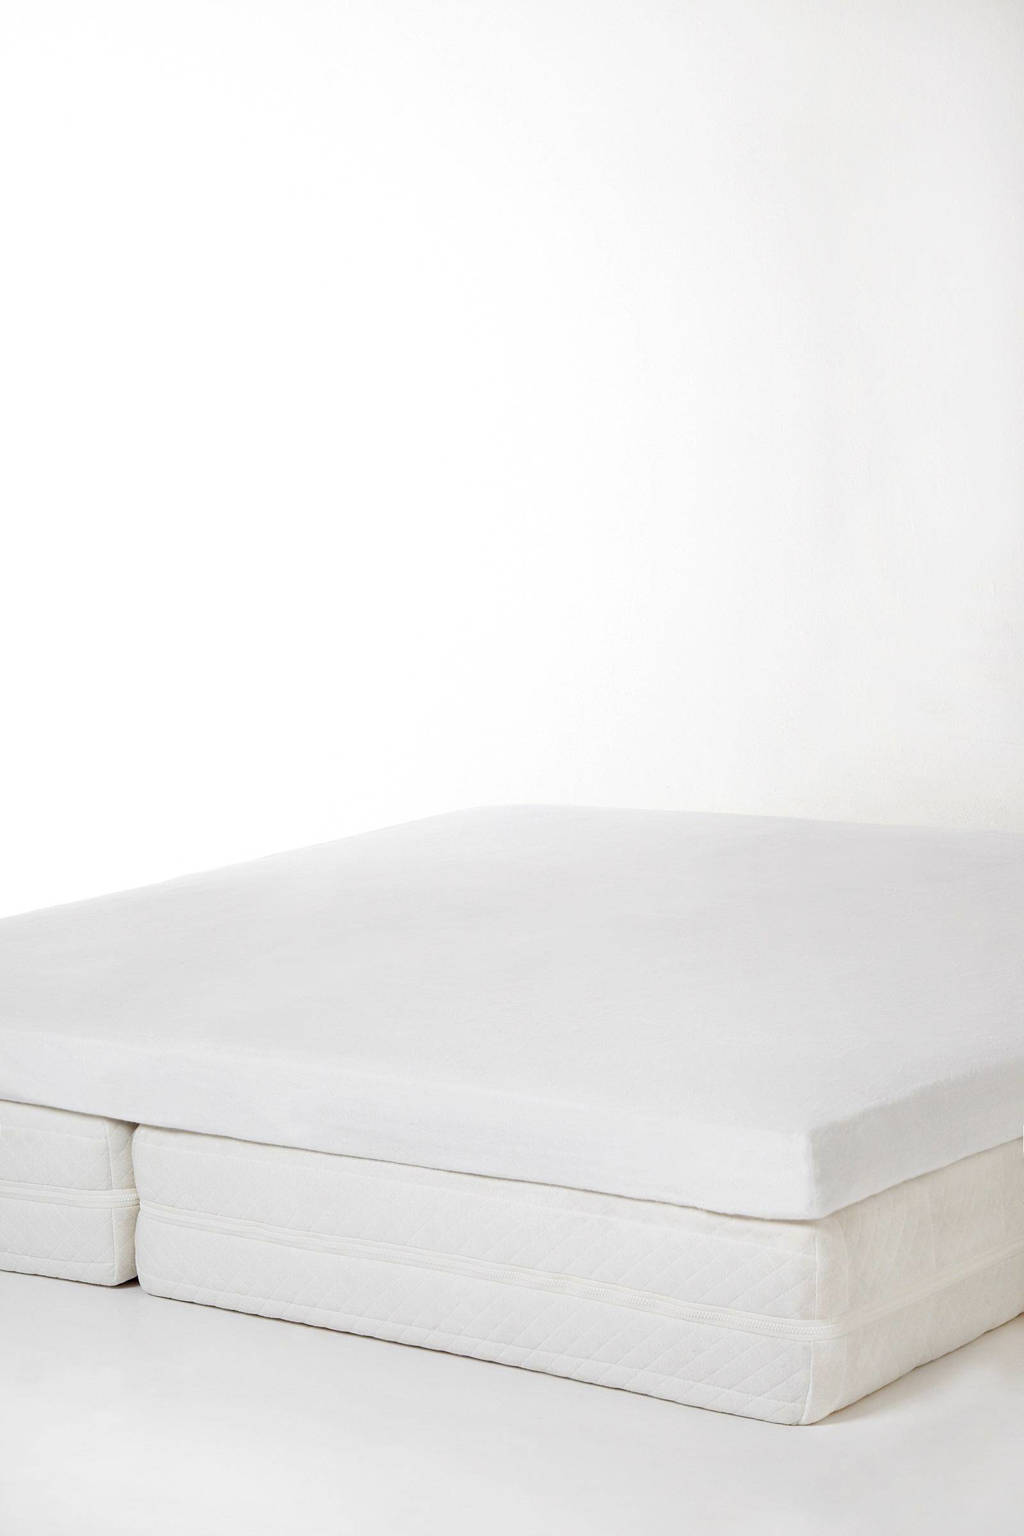 whkmp's own molton hoeslaken topmatras (tot 7 cm matrashoogte), Wit